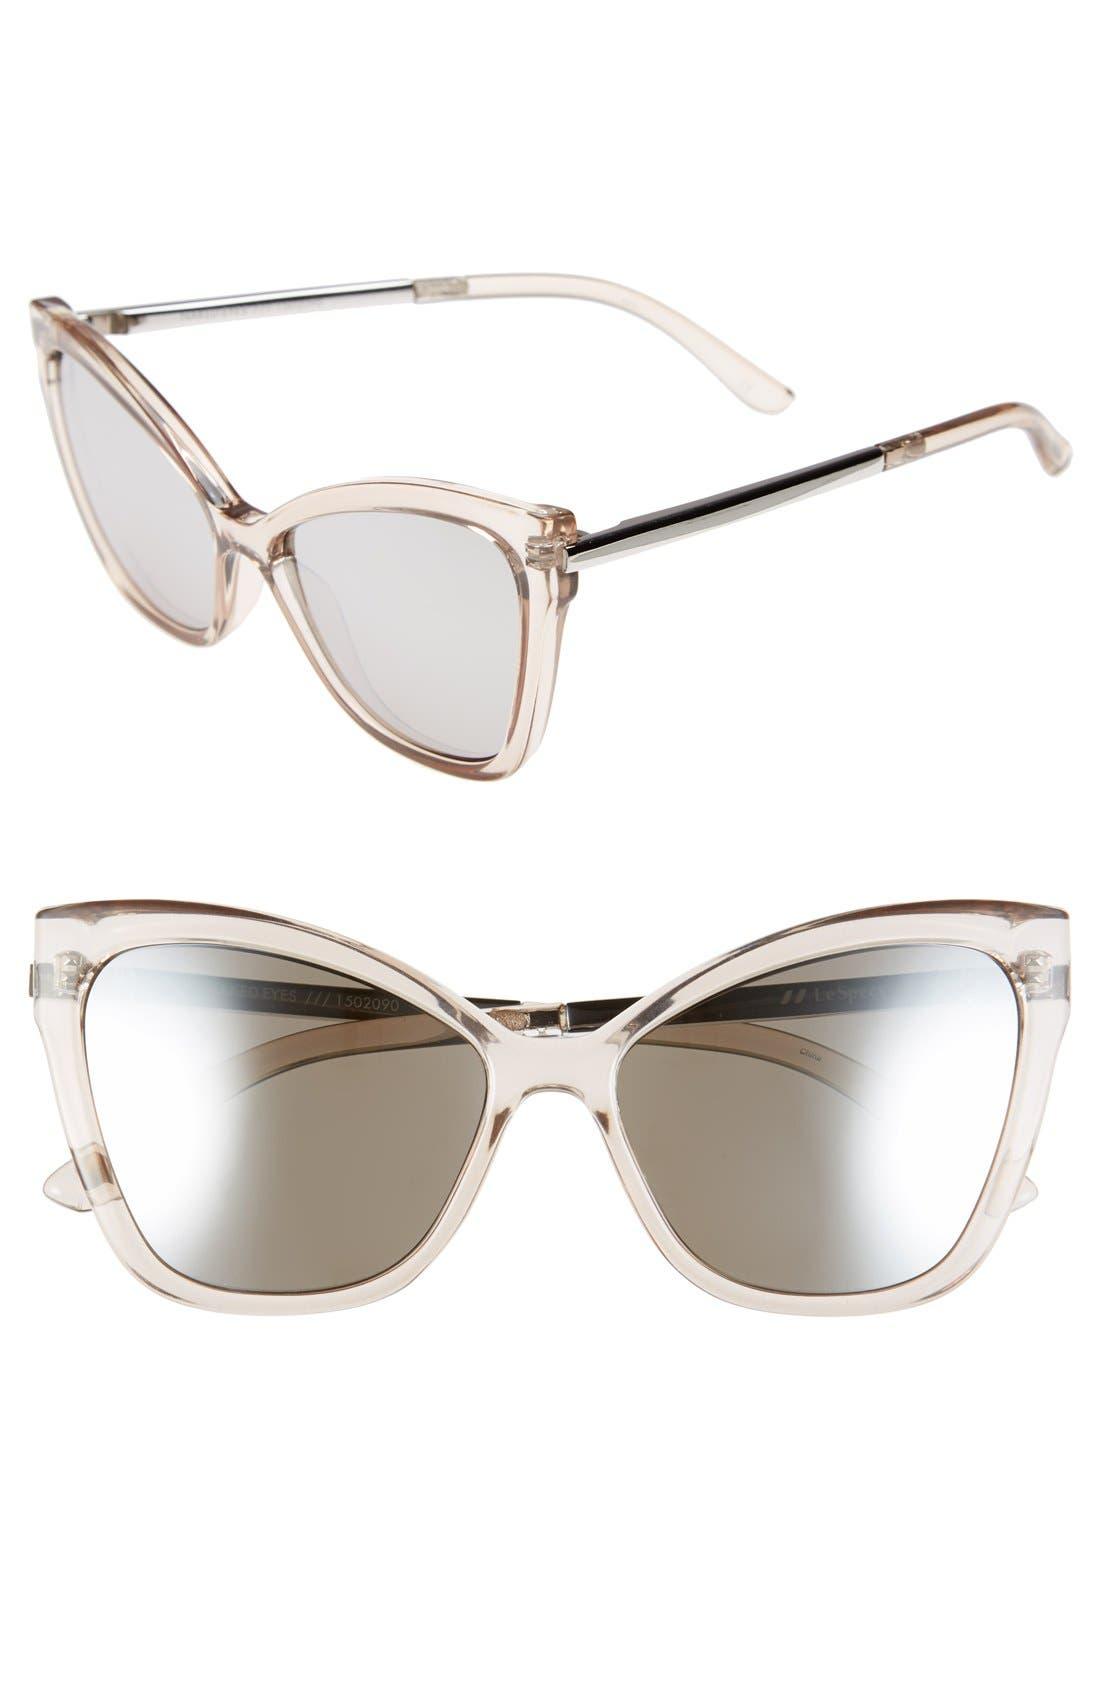 LE SPECS 'Naked Eyes' 56mm Cat Eye Sunglasses, Main, color, 020